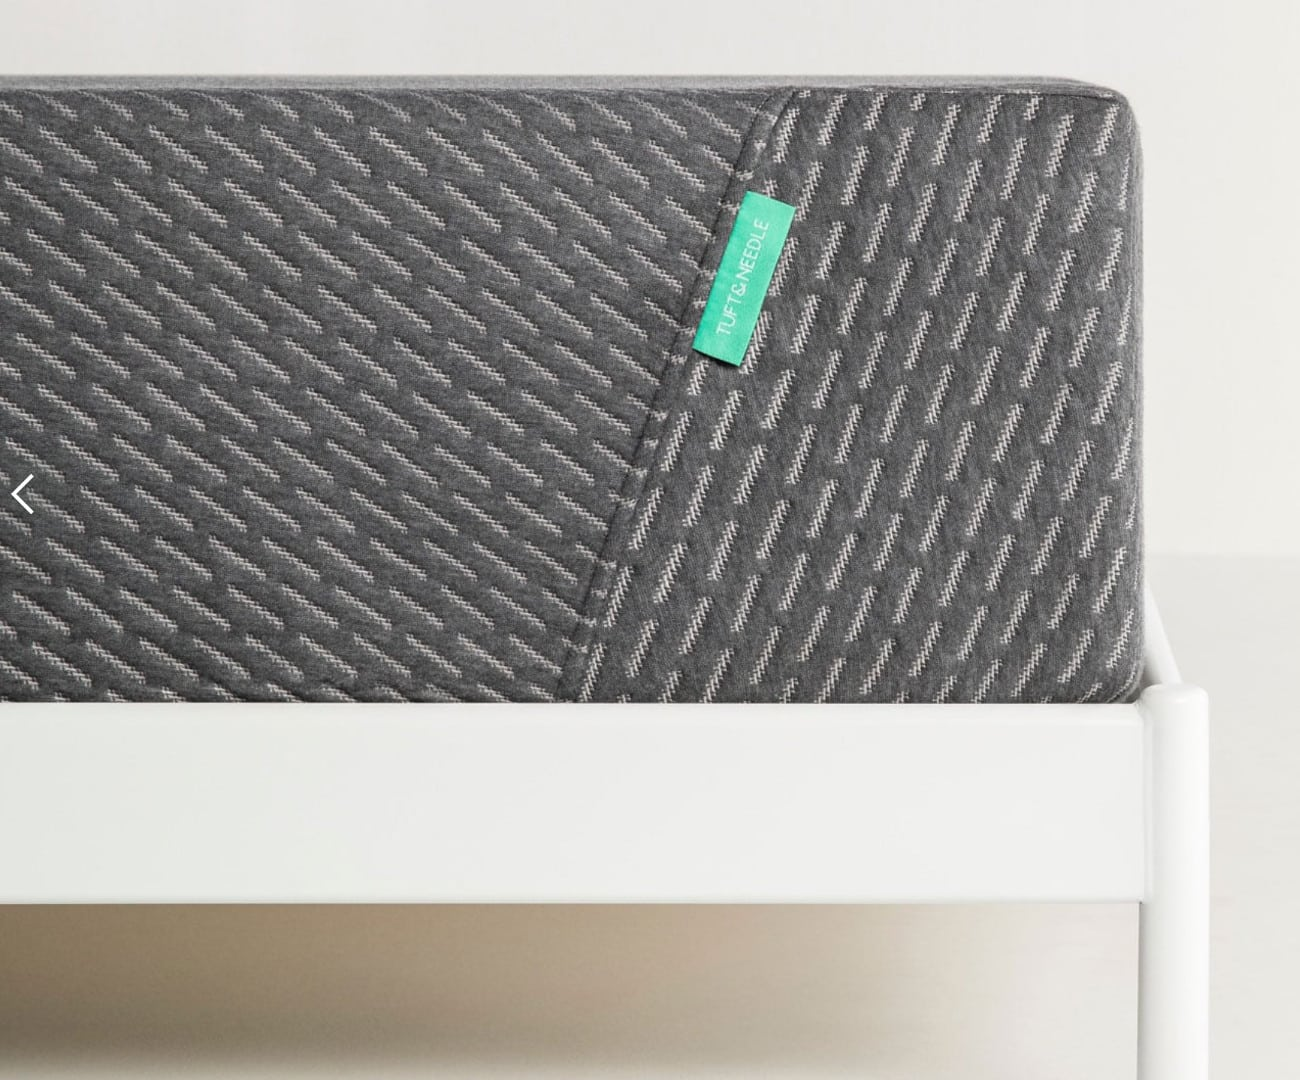 tuft and needle mint mattress with platform base